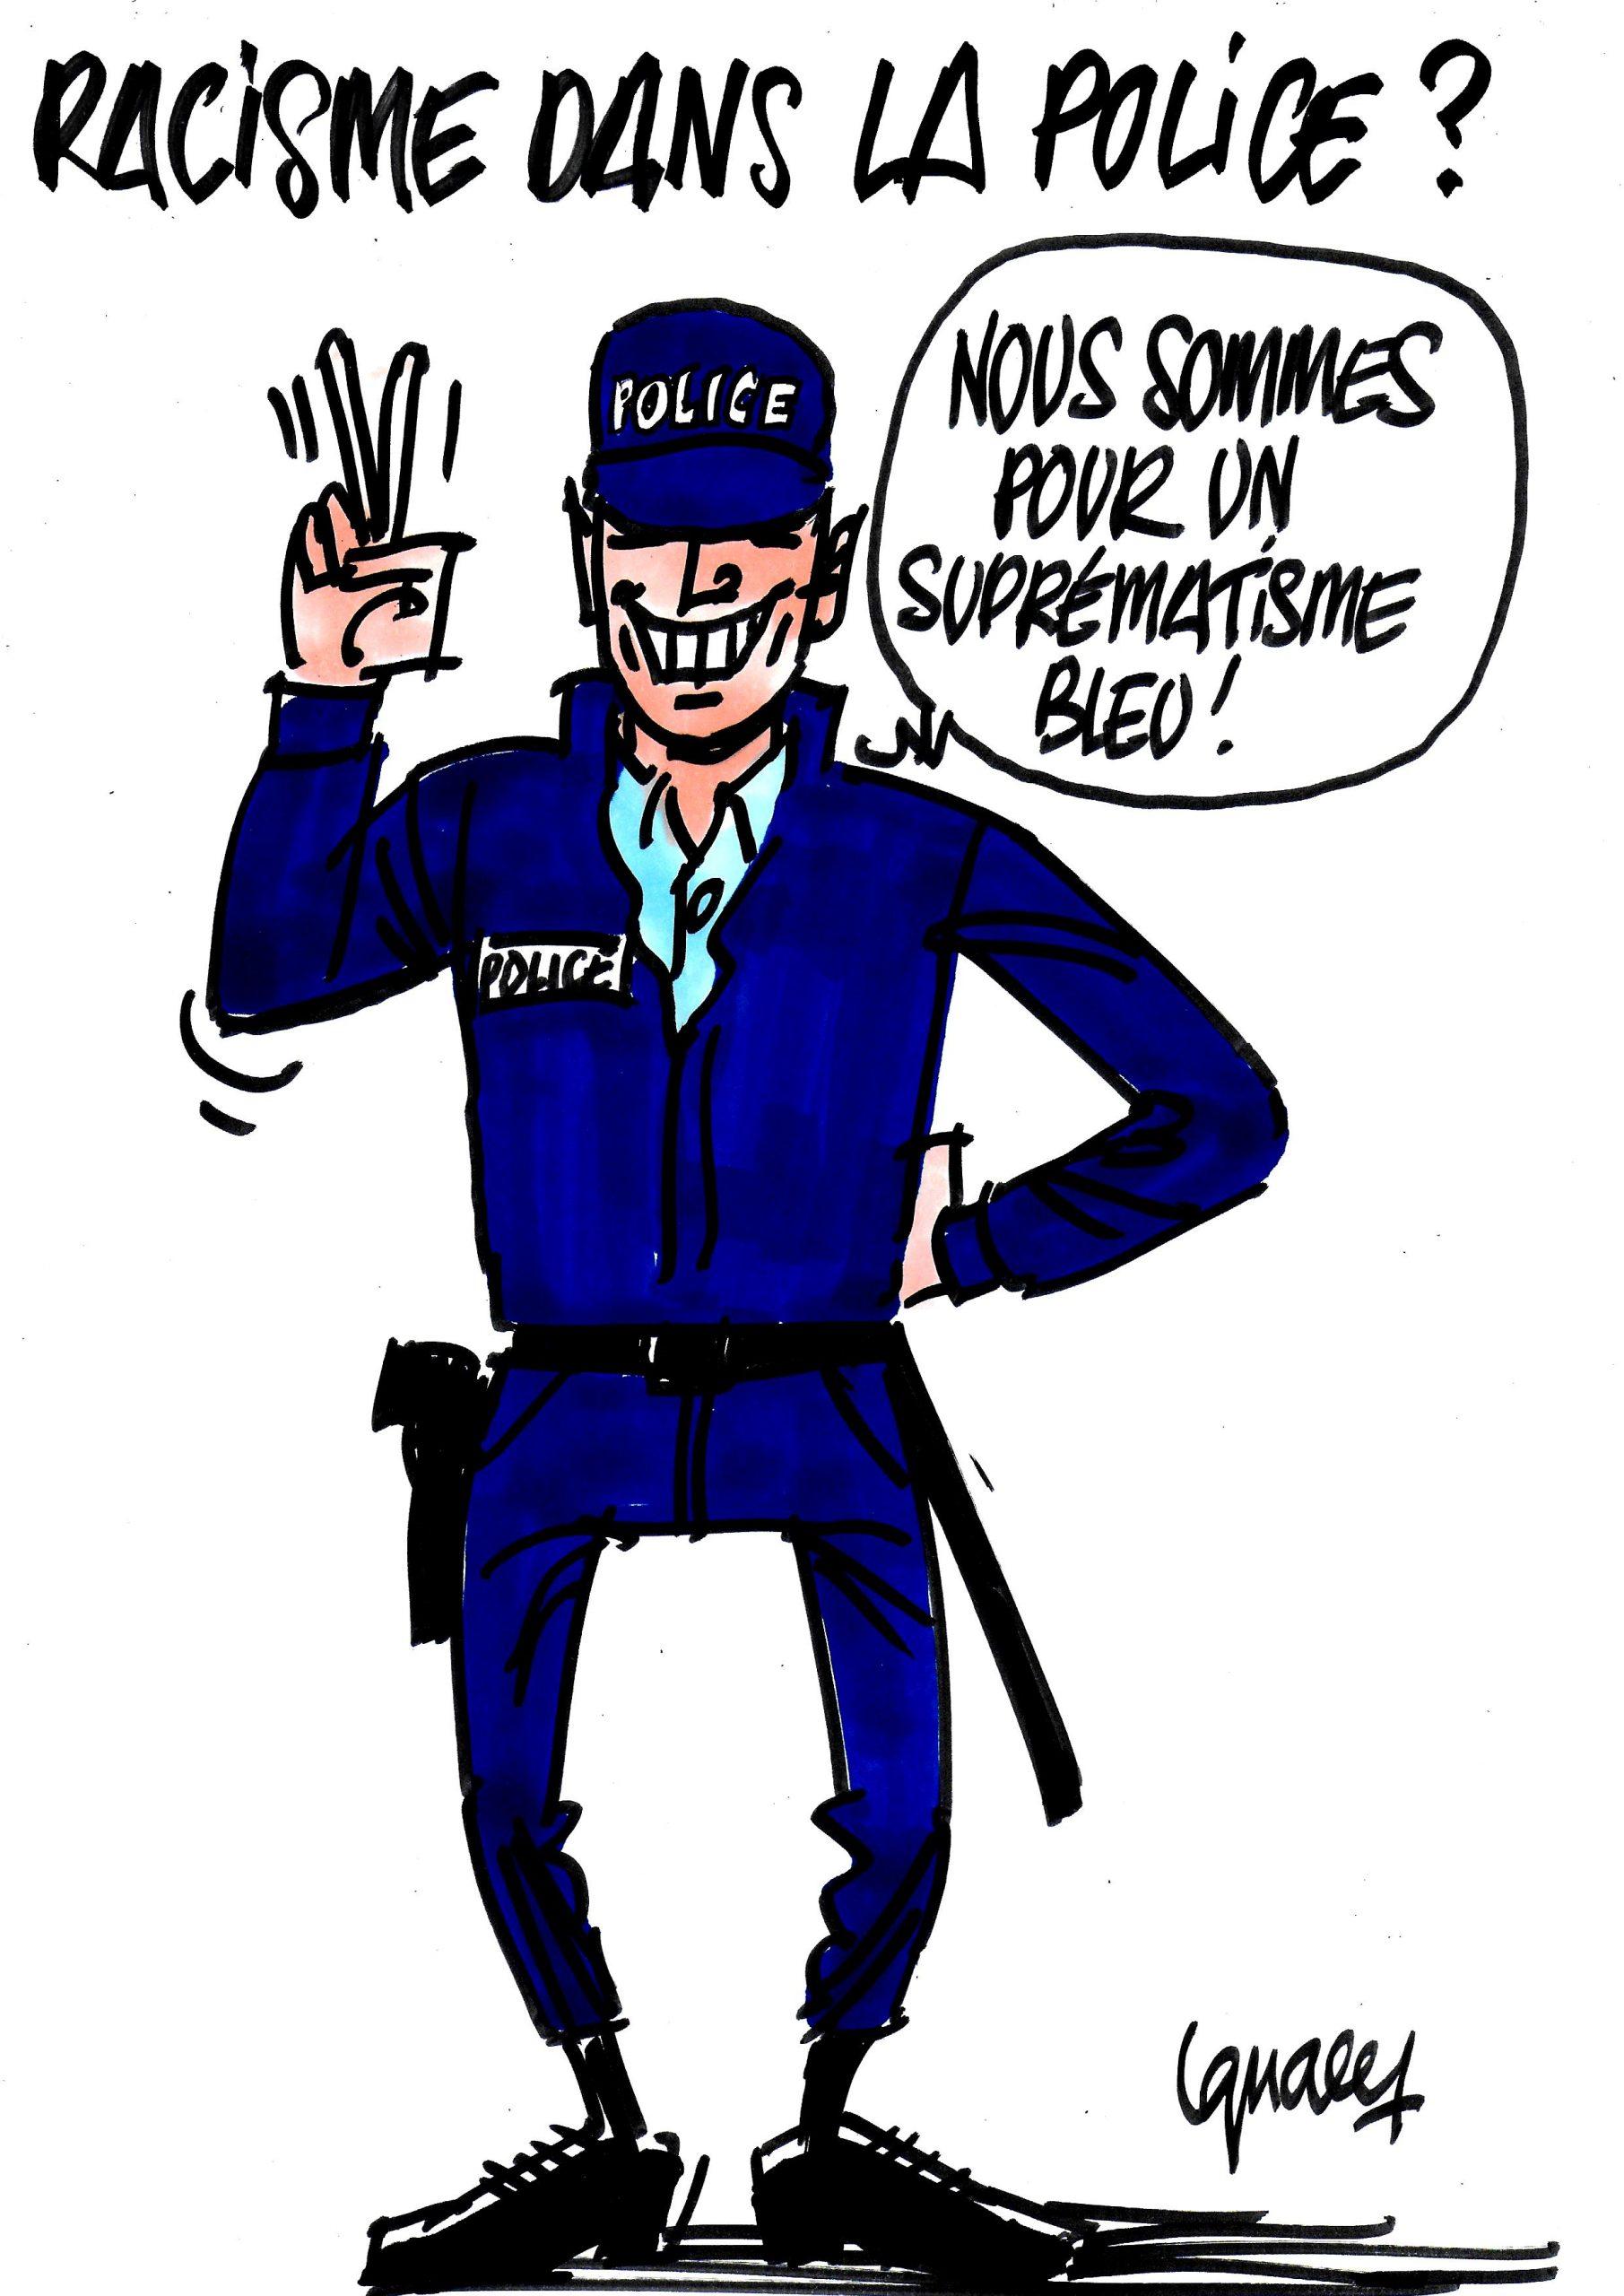 Ignace - Racisme dans la police ?